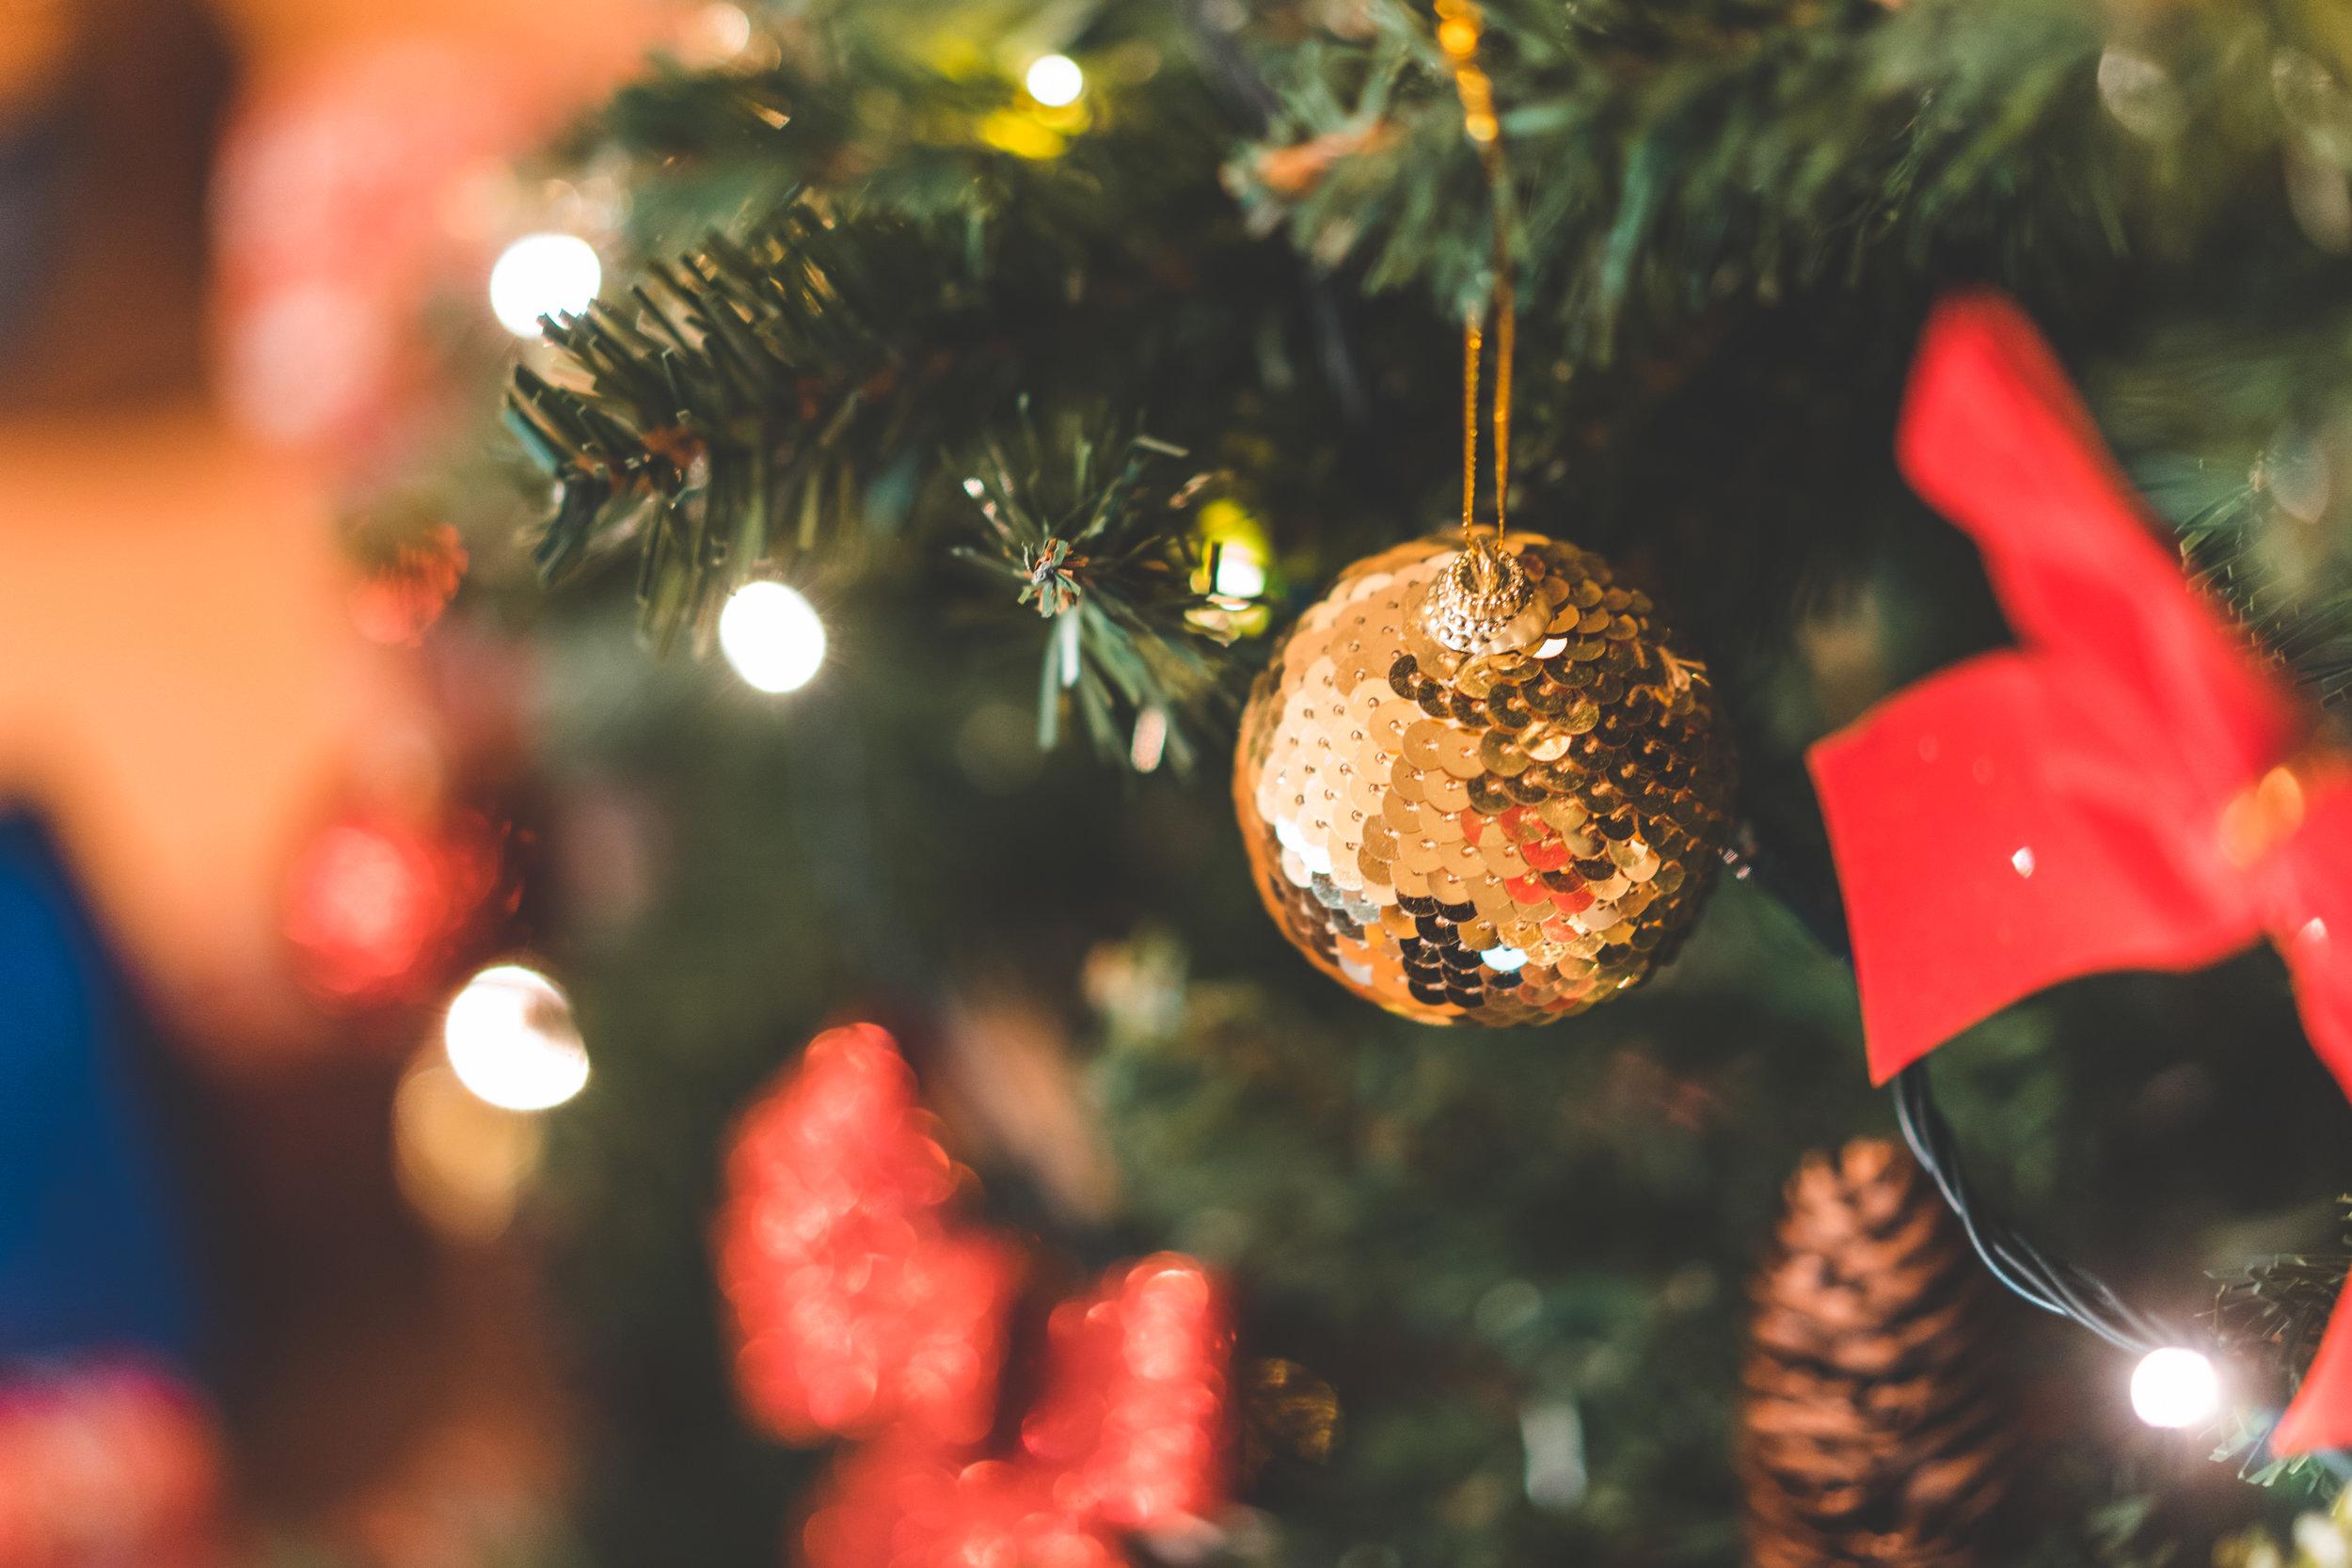 glitter-decorative-christmas-ball-picjumbo-com.jpg